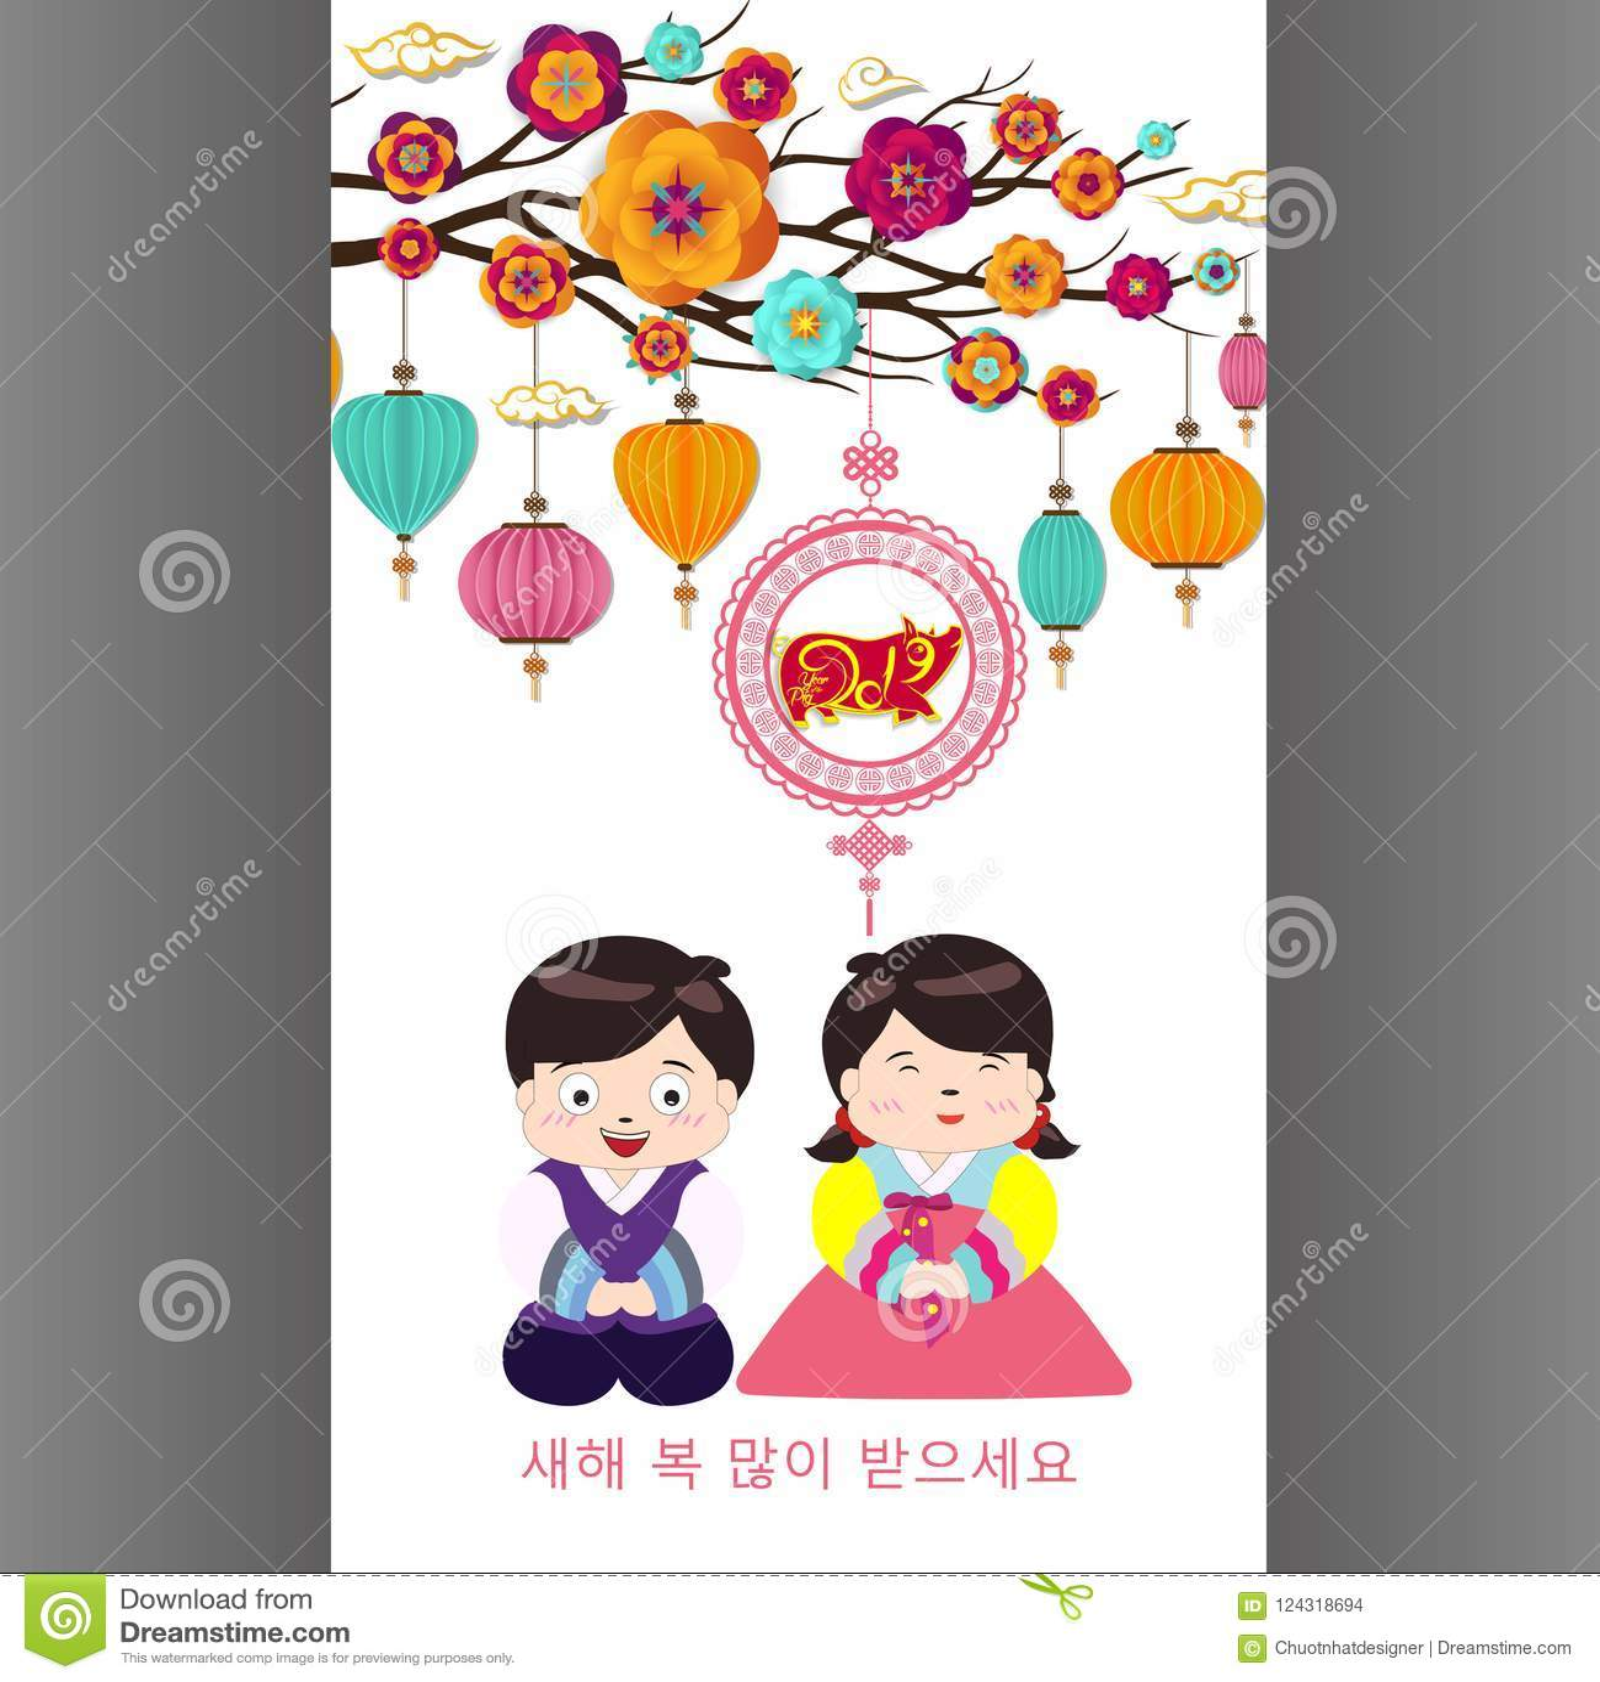 Korean traditional happy new year day korean characters mean happy download korean traditional happy new year day korean characters mean happy new year childrens m4hsunfo